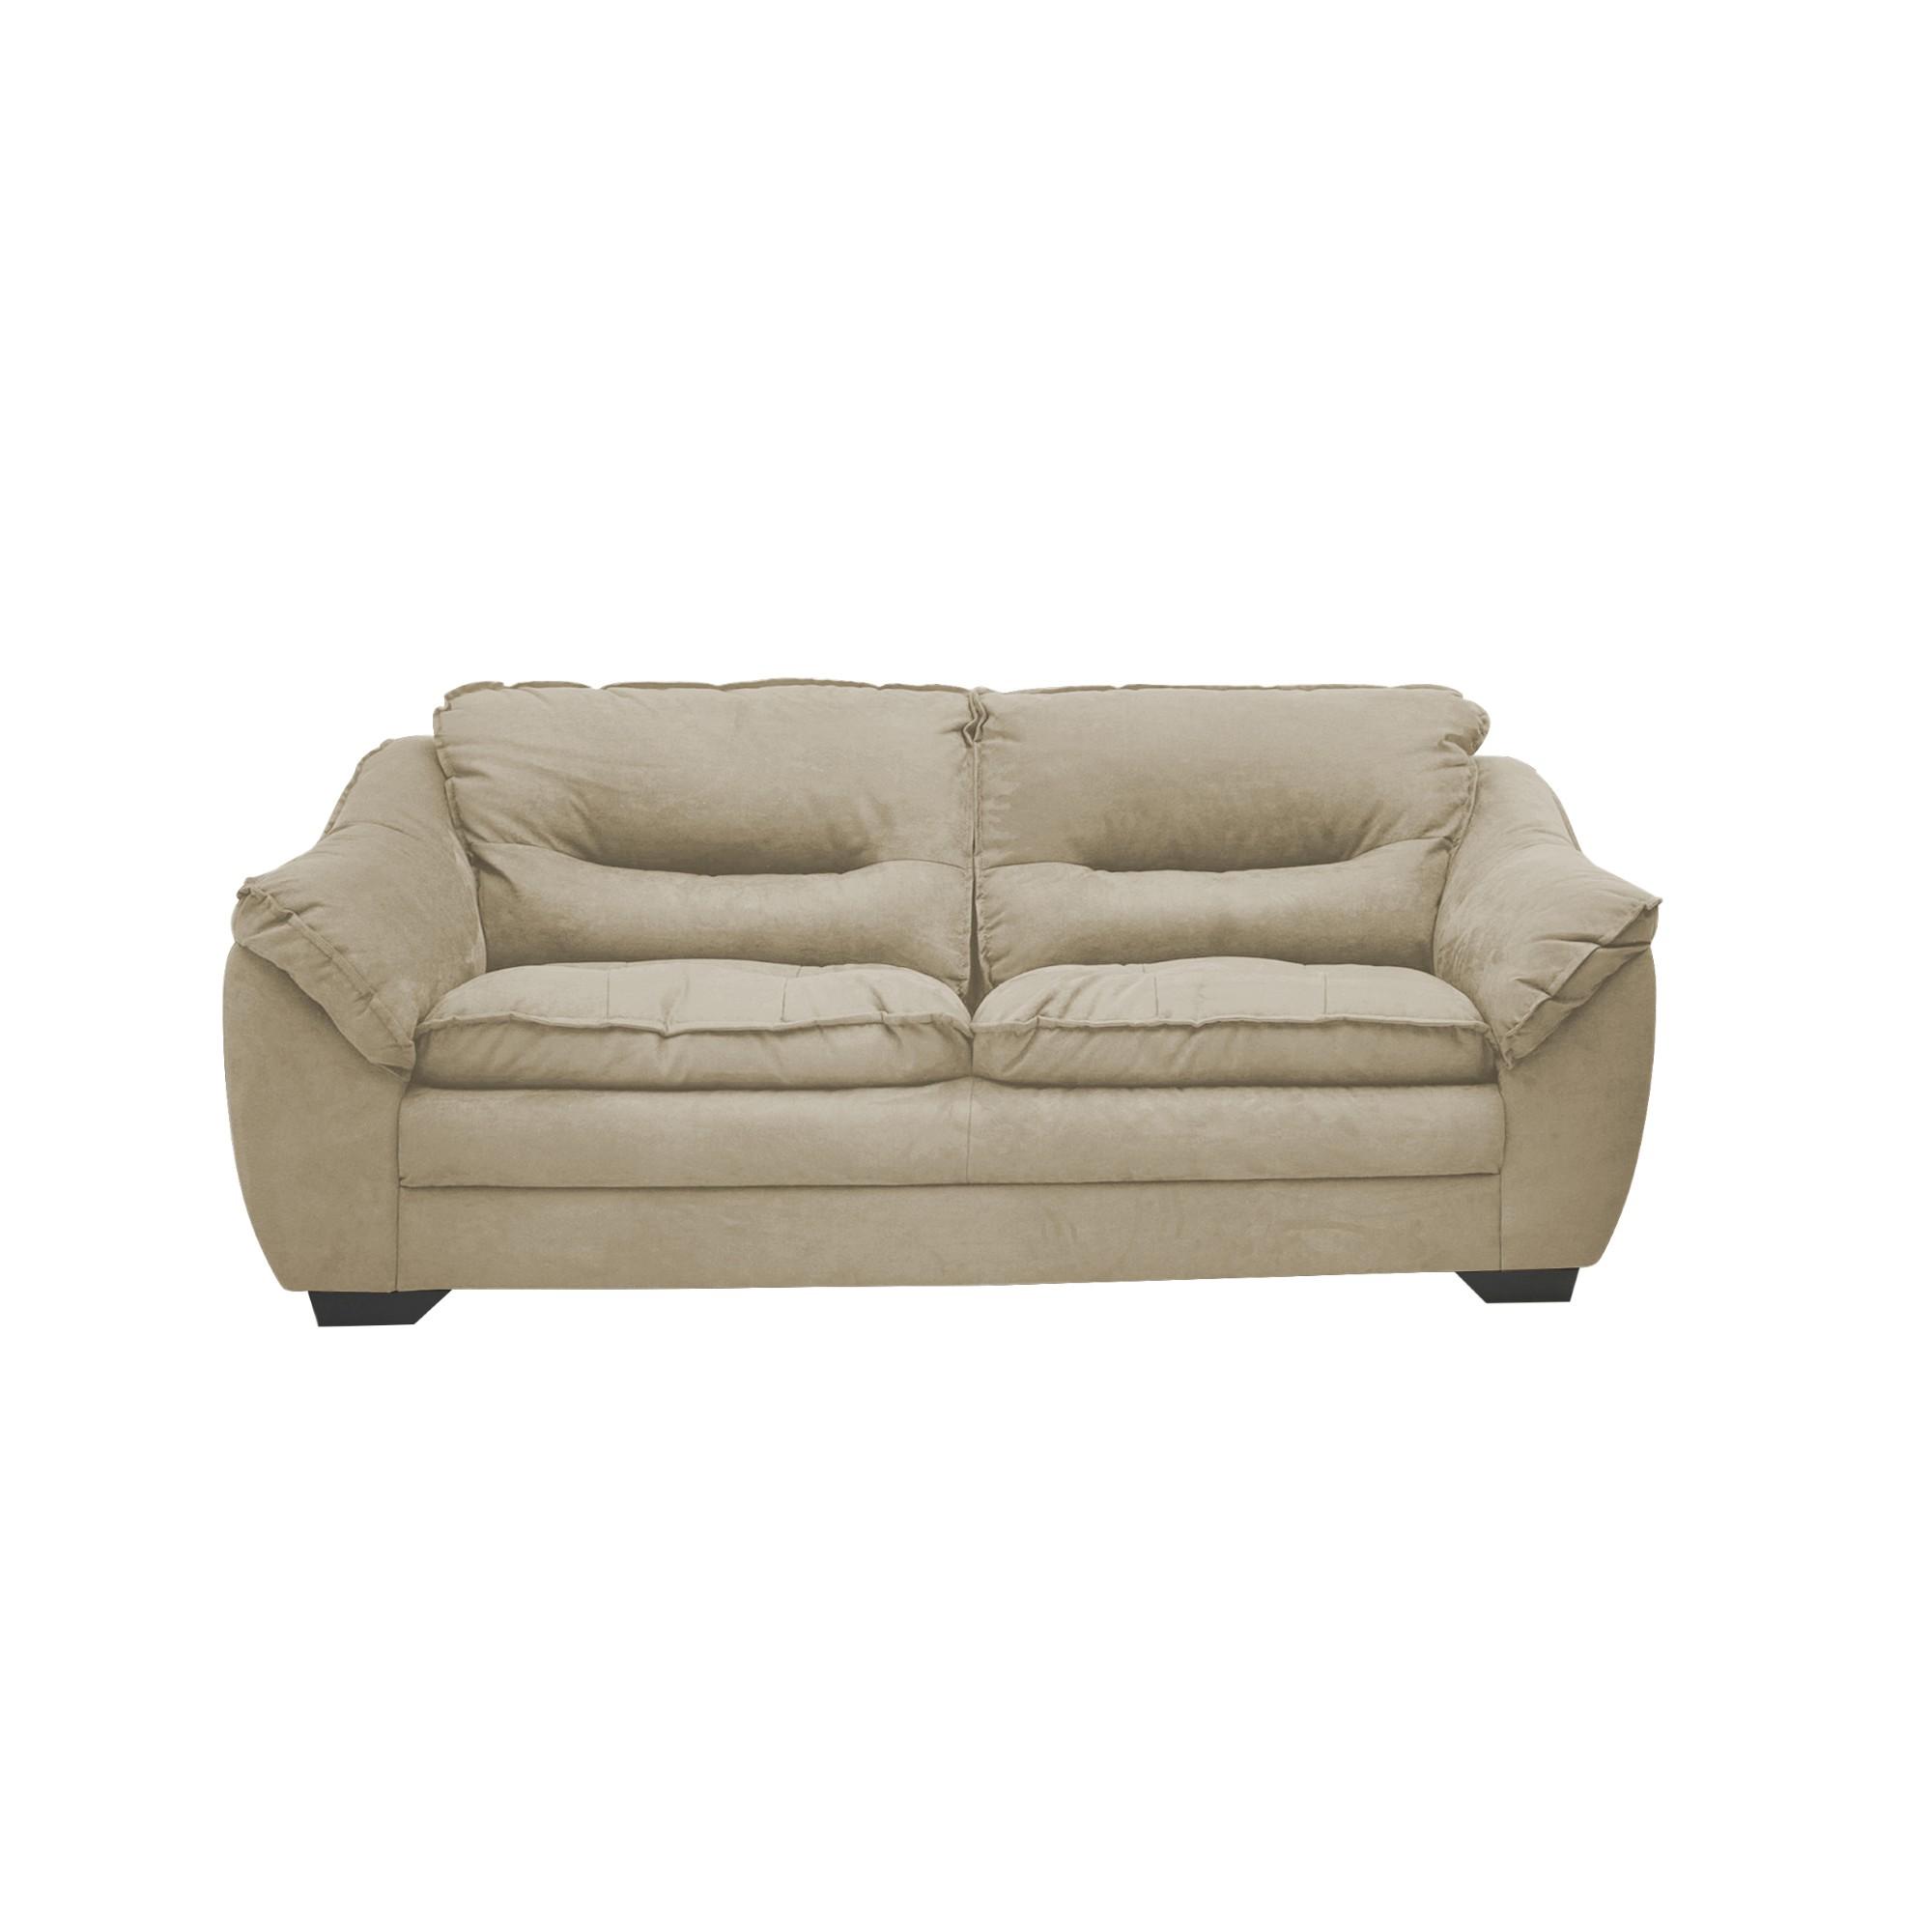 Sofa Floyd 3 Lugares Veludo 210 x 90 x 93 Bege - Spazzio